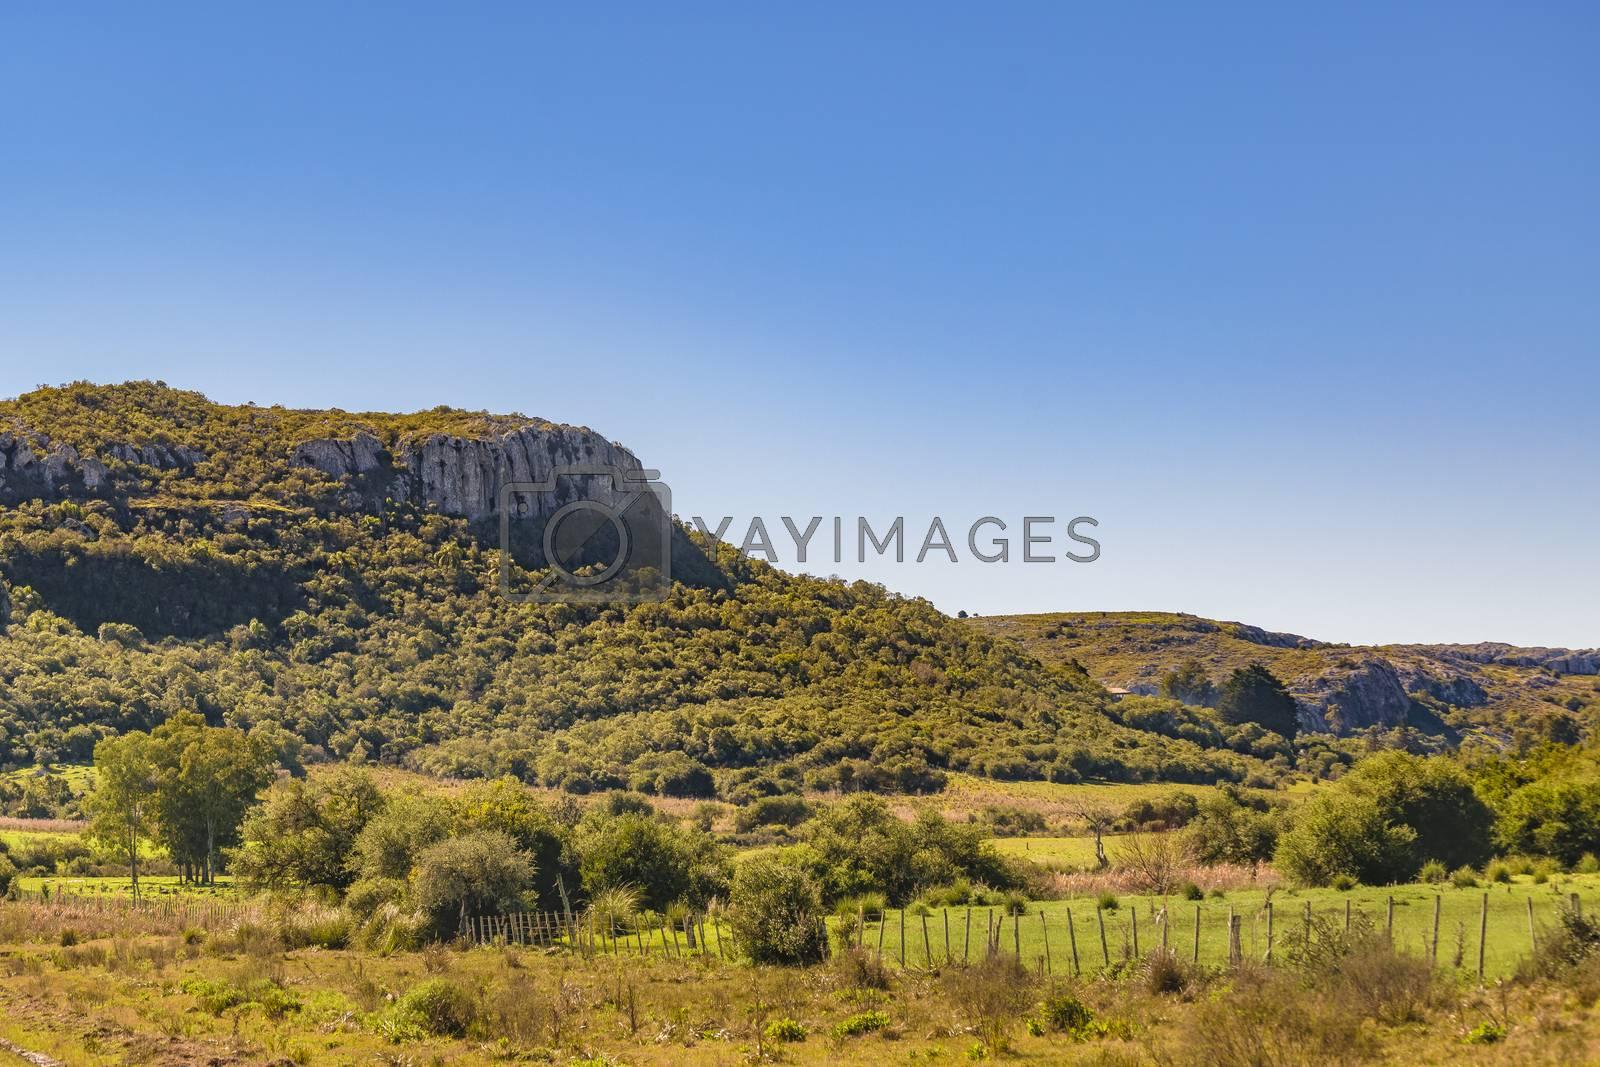 Countryside landscape environment located in Maldonado city outskirts, Uruguay